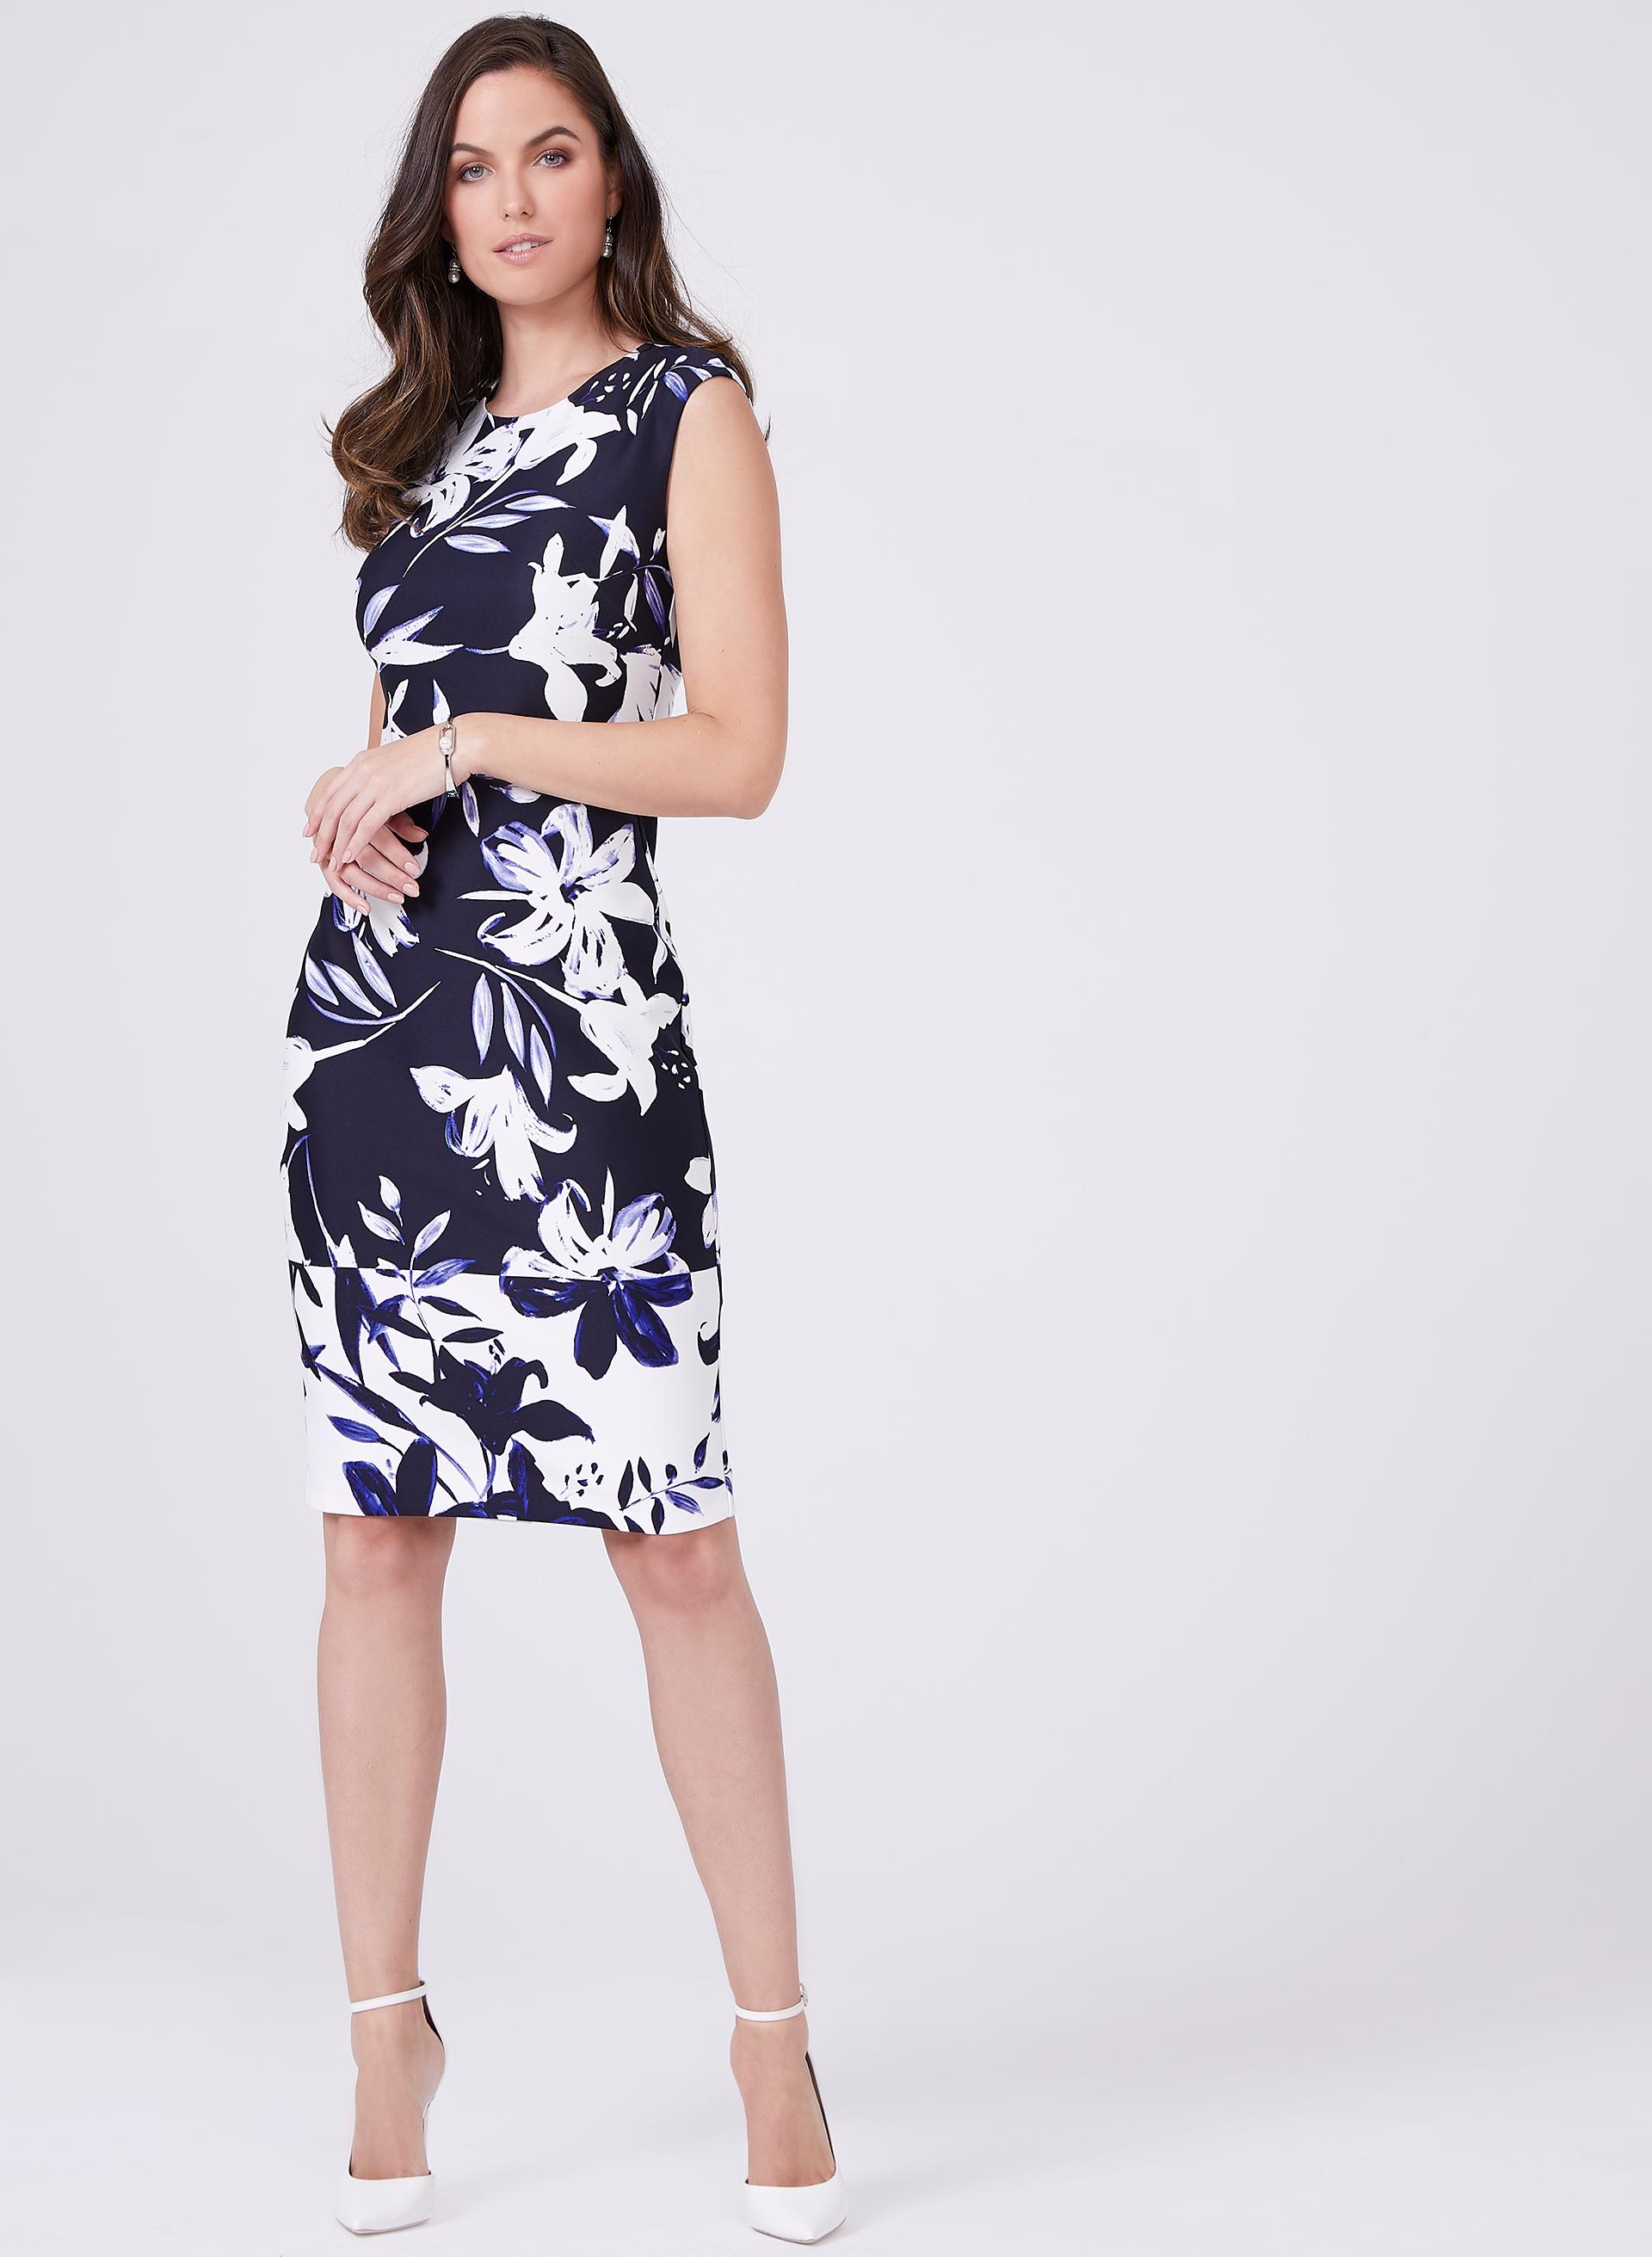 Vince Camuto Floral Sheath Dress Melanie Lyne